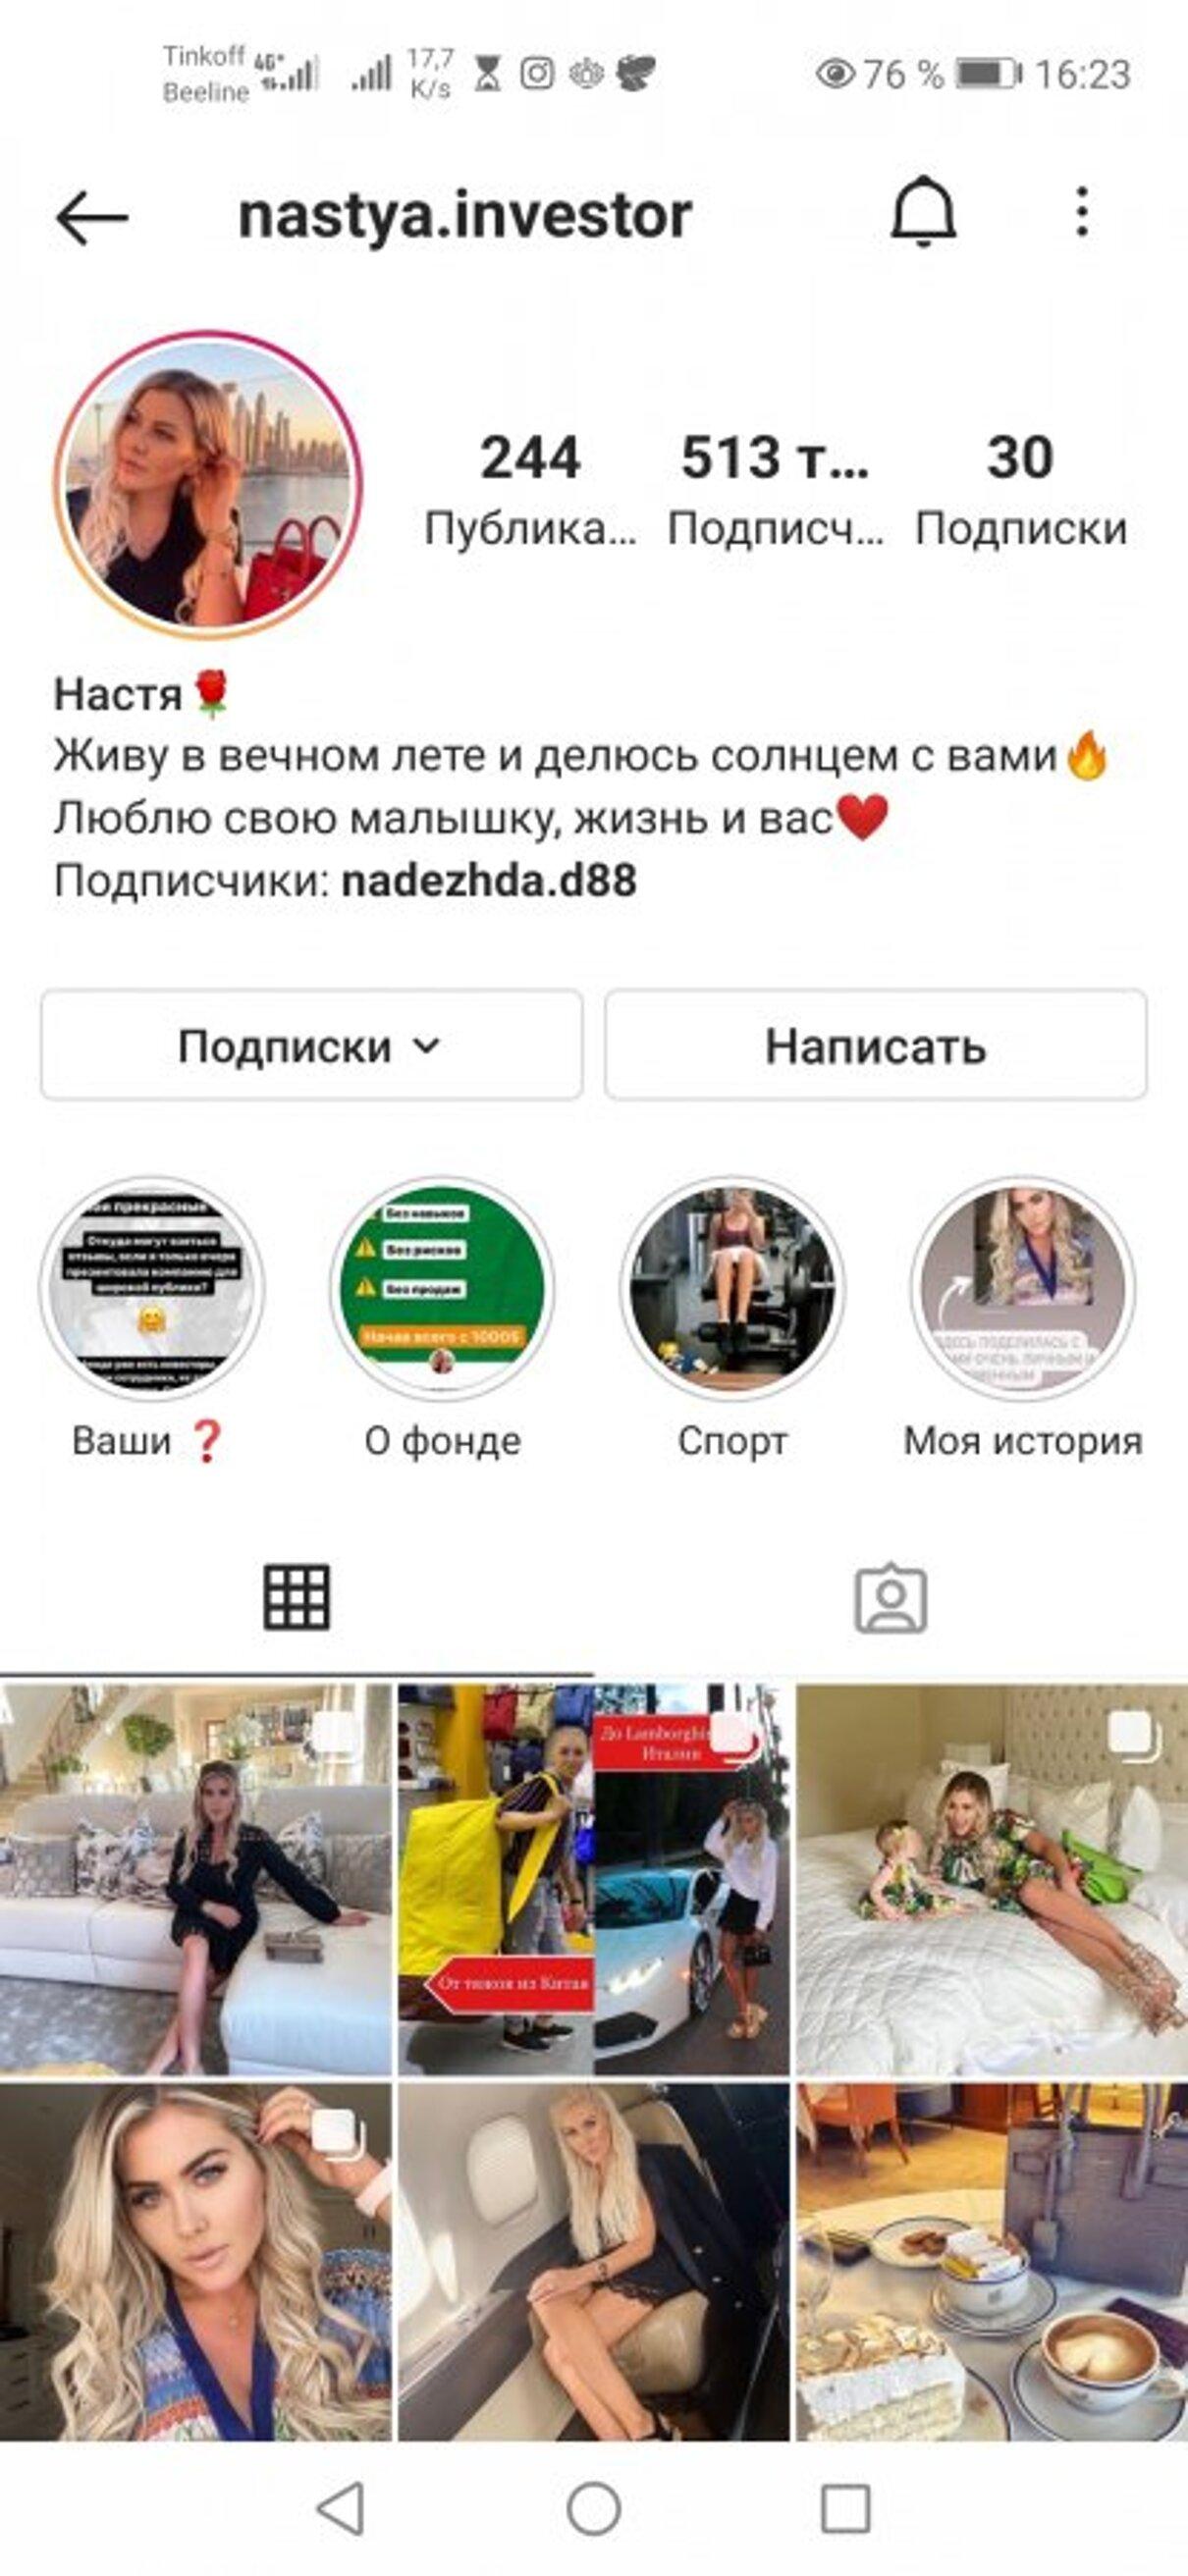 Жалоба-отзыв: Https://instagram.com/nastya.investor? utm_medium=copy_link - Мошенница Nastya.investor